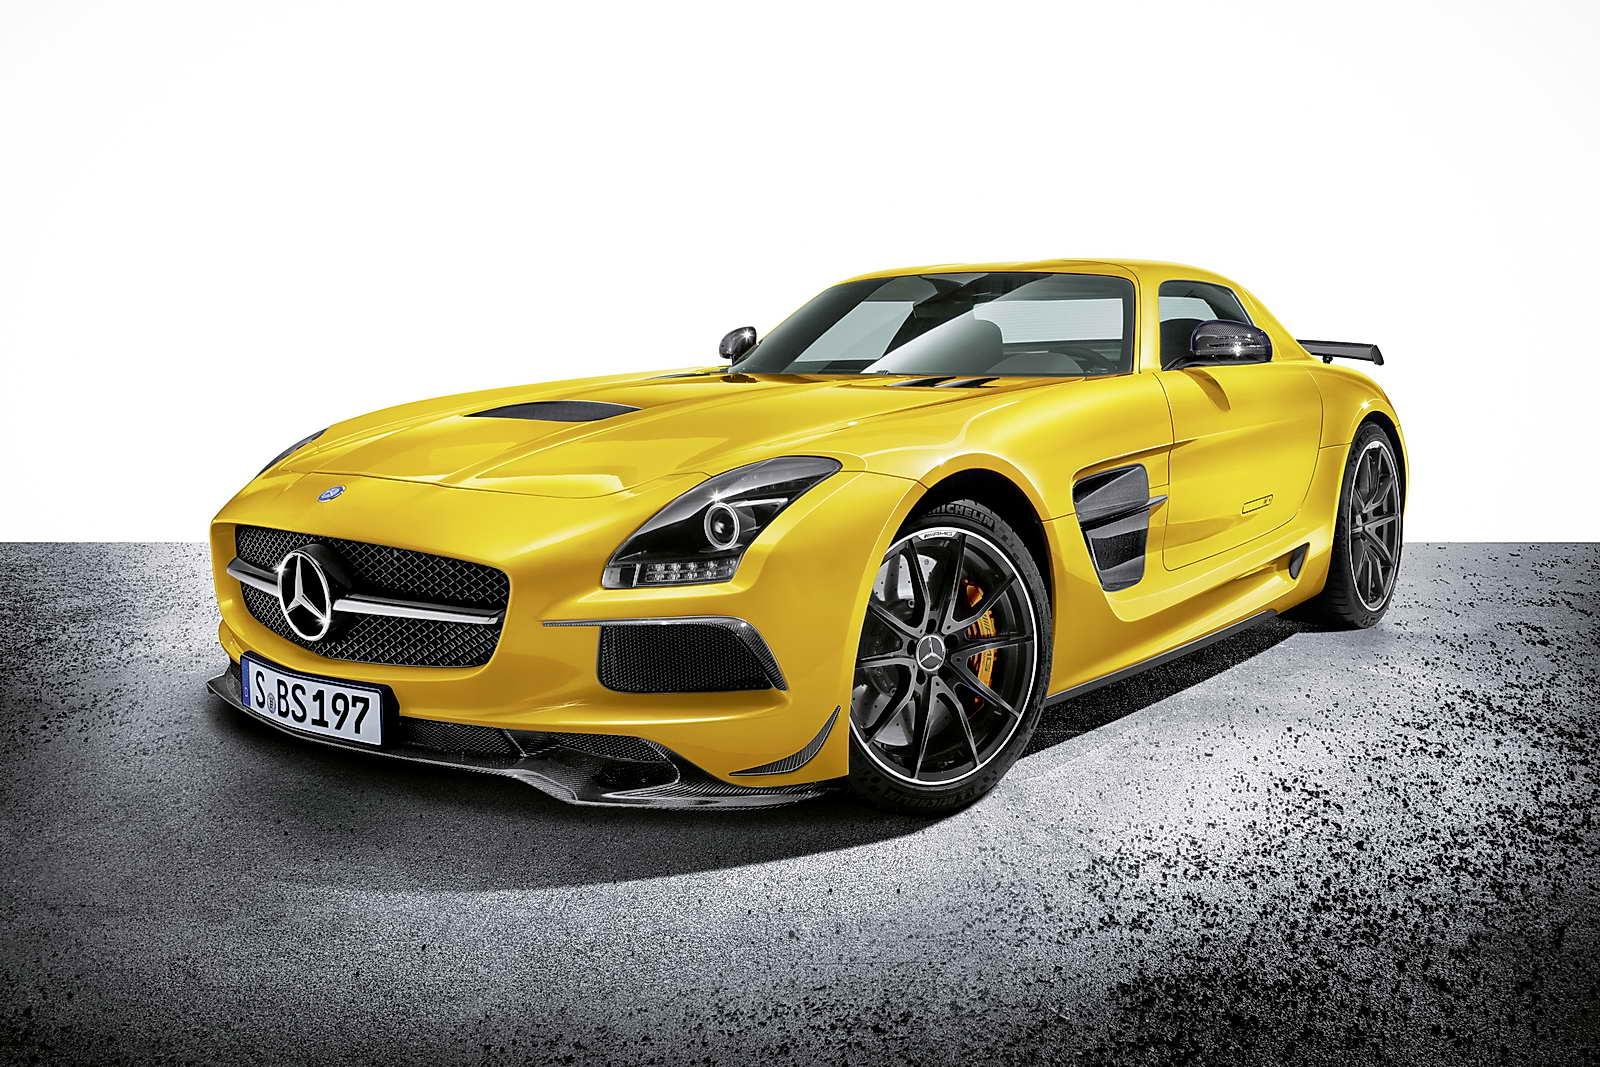 Mercedes_Benz_SLS_AMG_Coupe_Black_Series_01